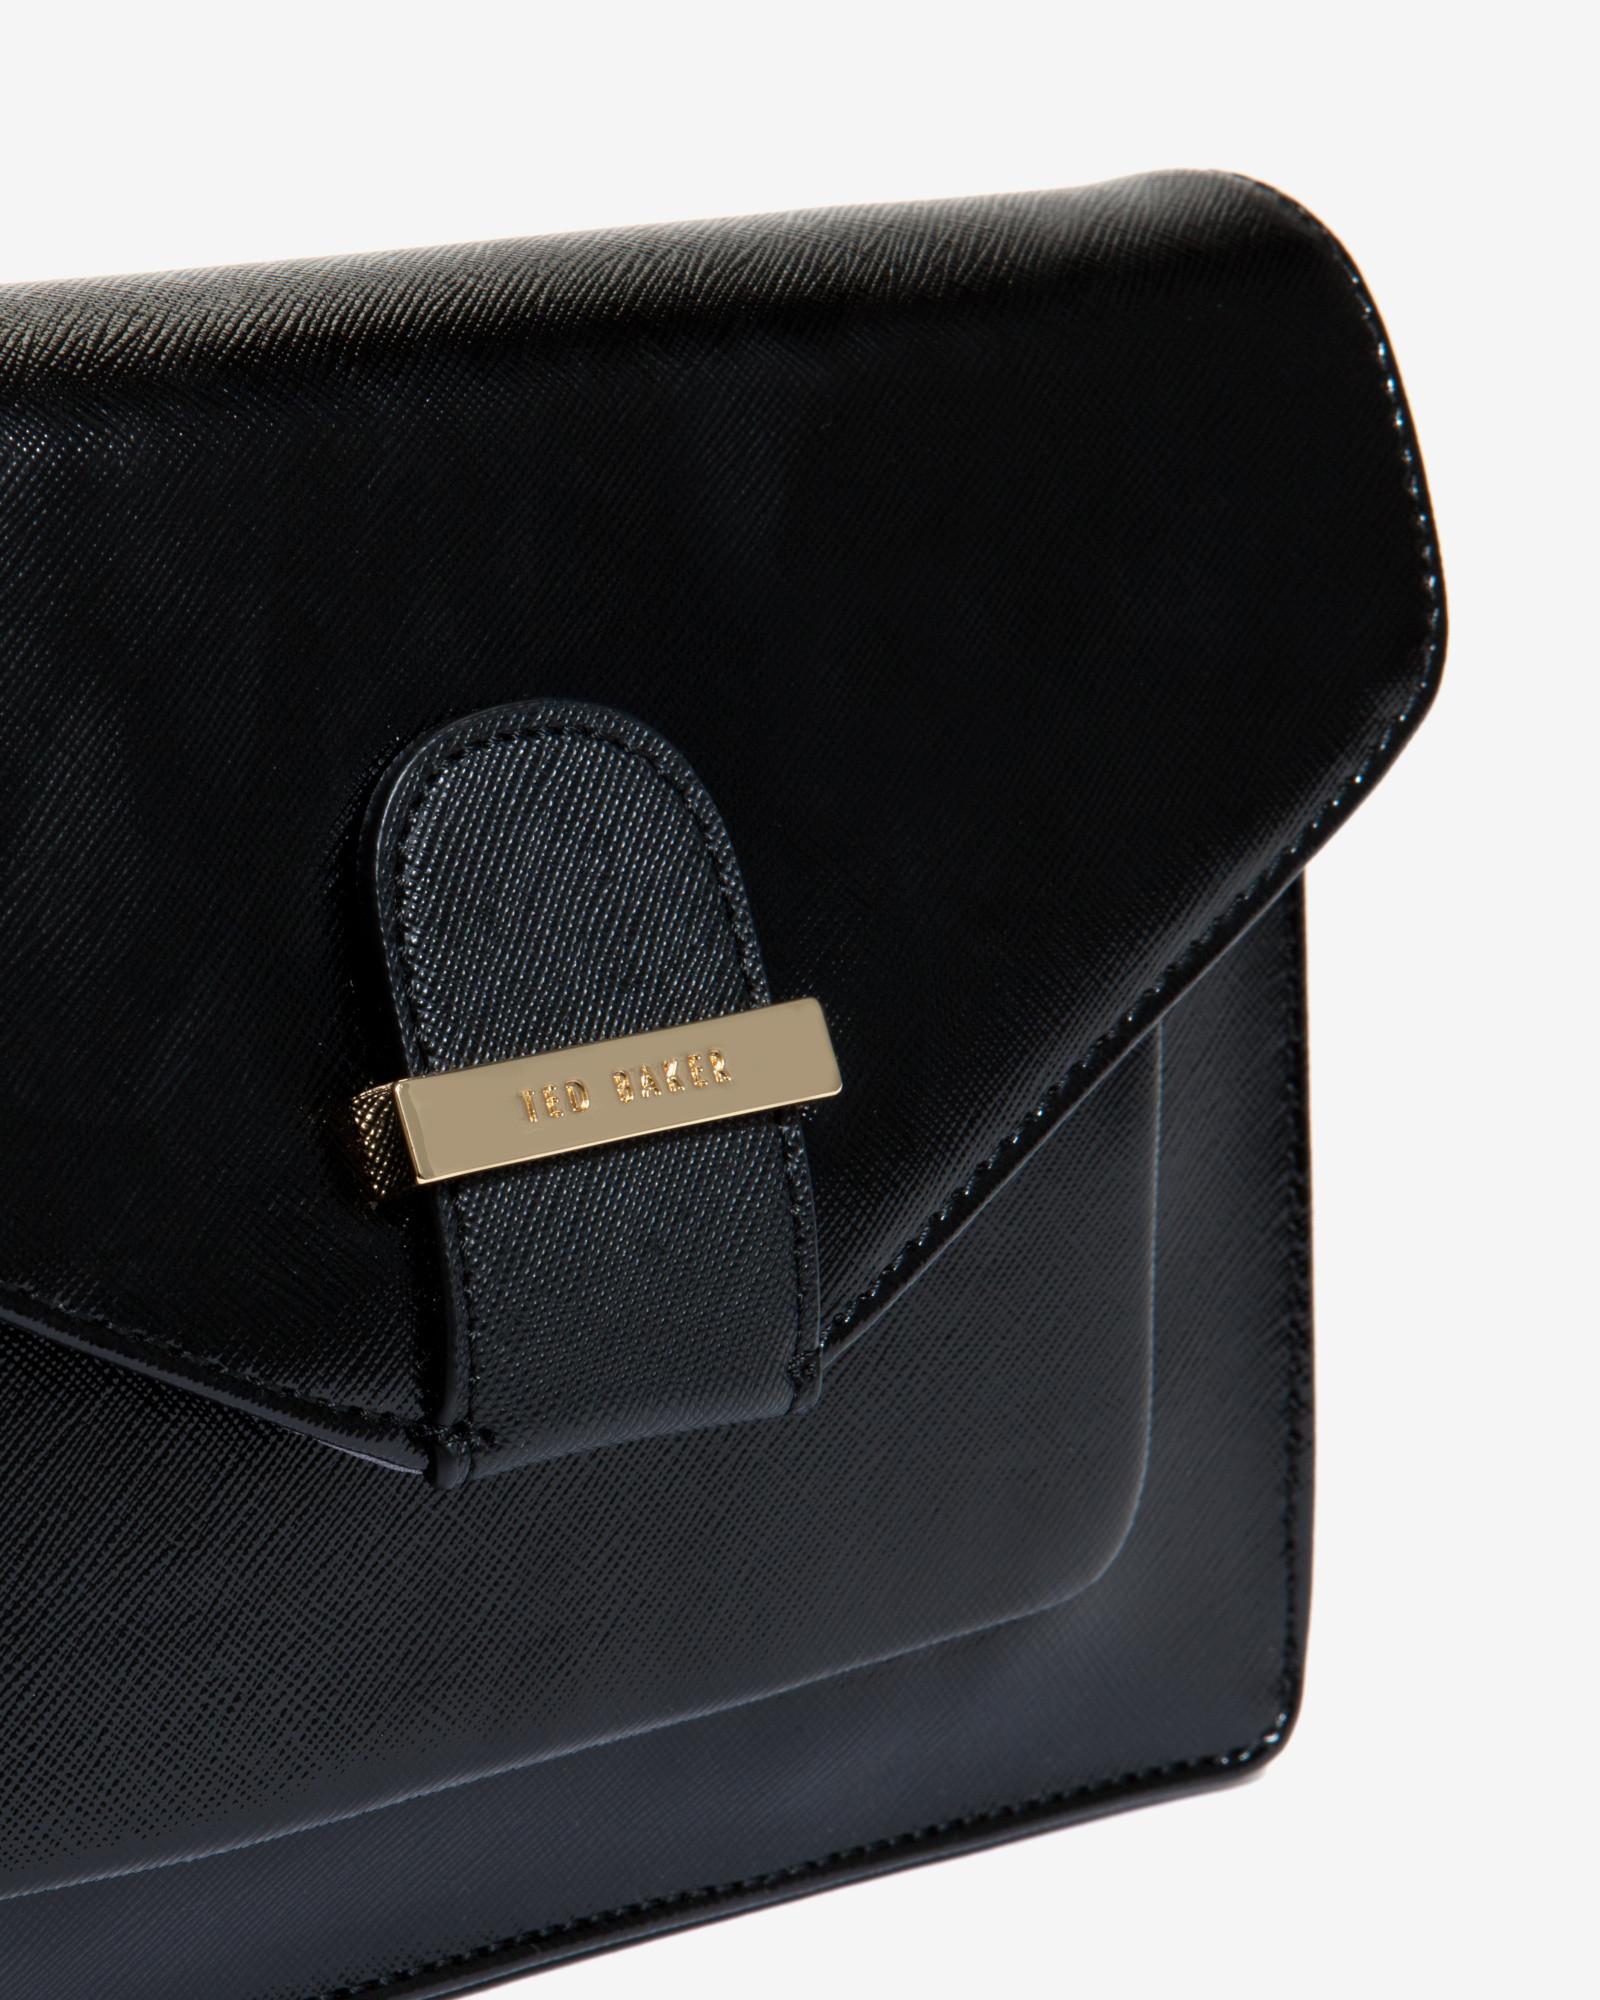 5c718719f777c Lyst - Ted Baker Patent Pocket Clutch Bag in Black